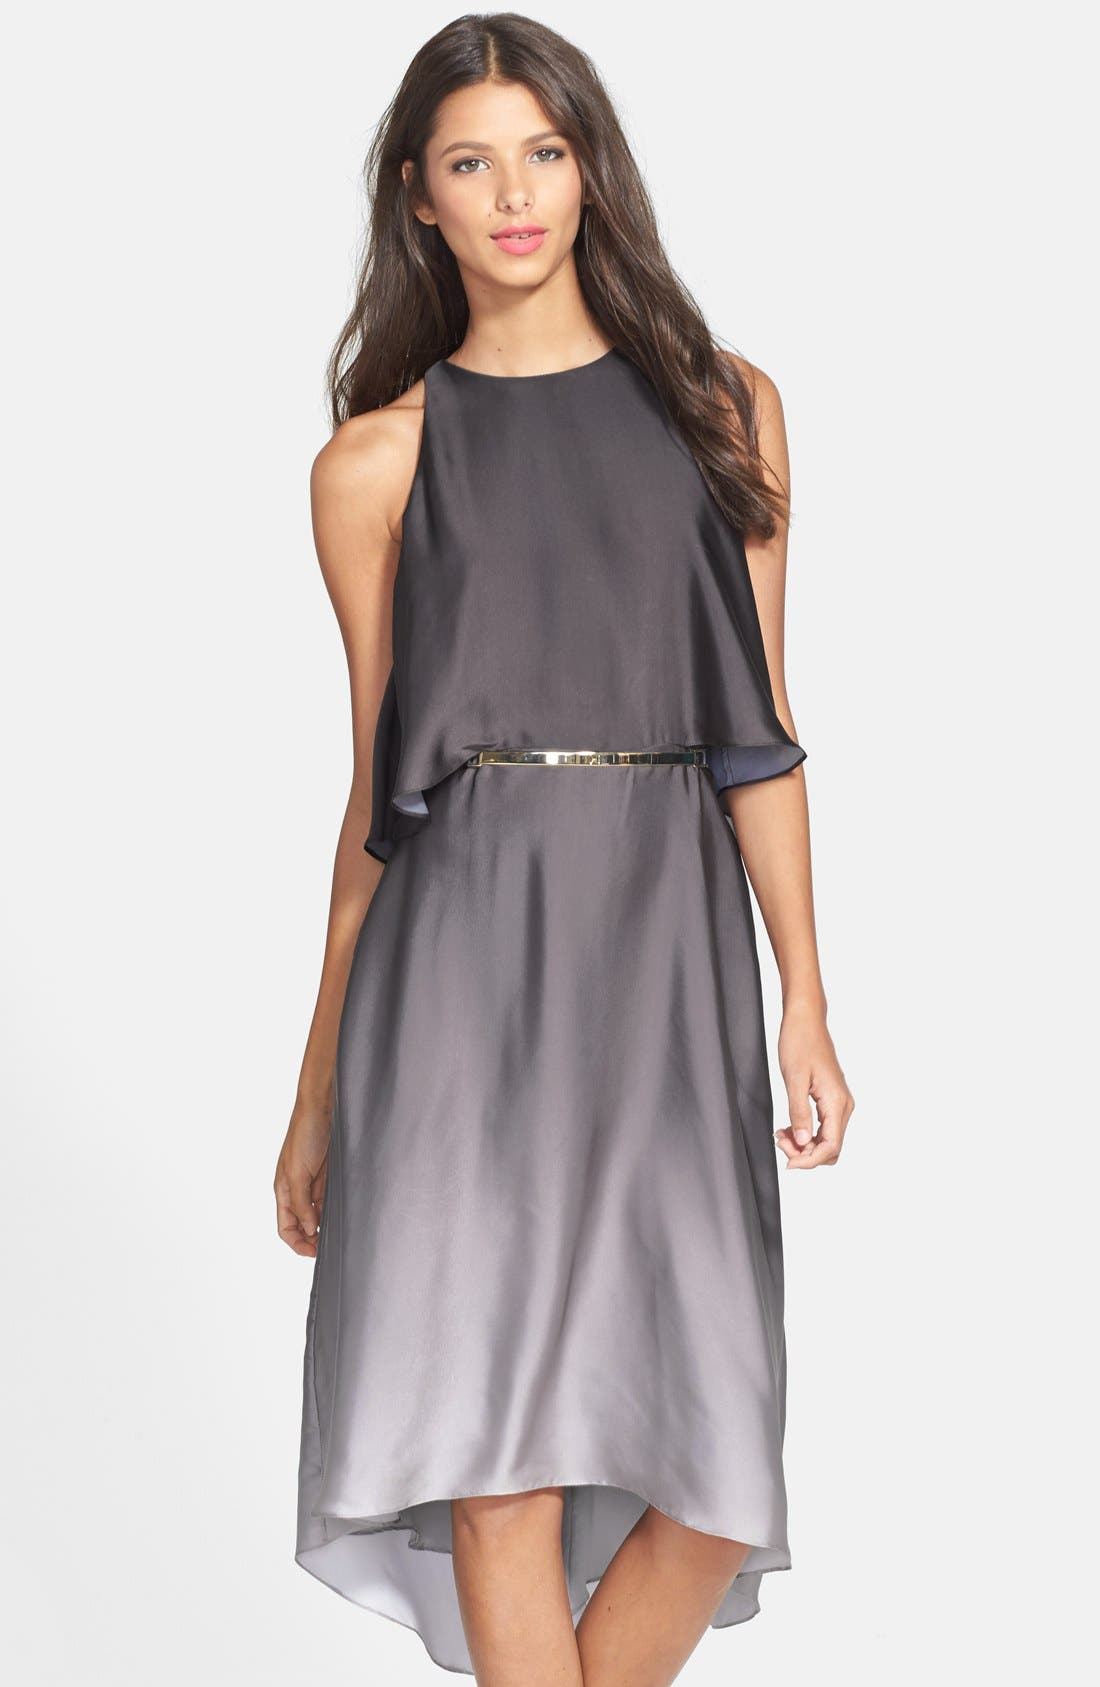 Alternate Image 1 Selected - Halston Heritage Ruffle Back Ombré Charmeuse Dress